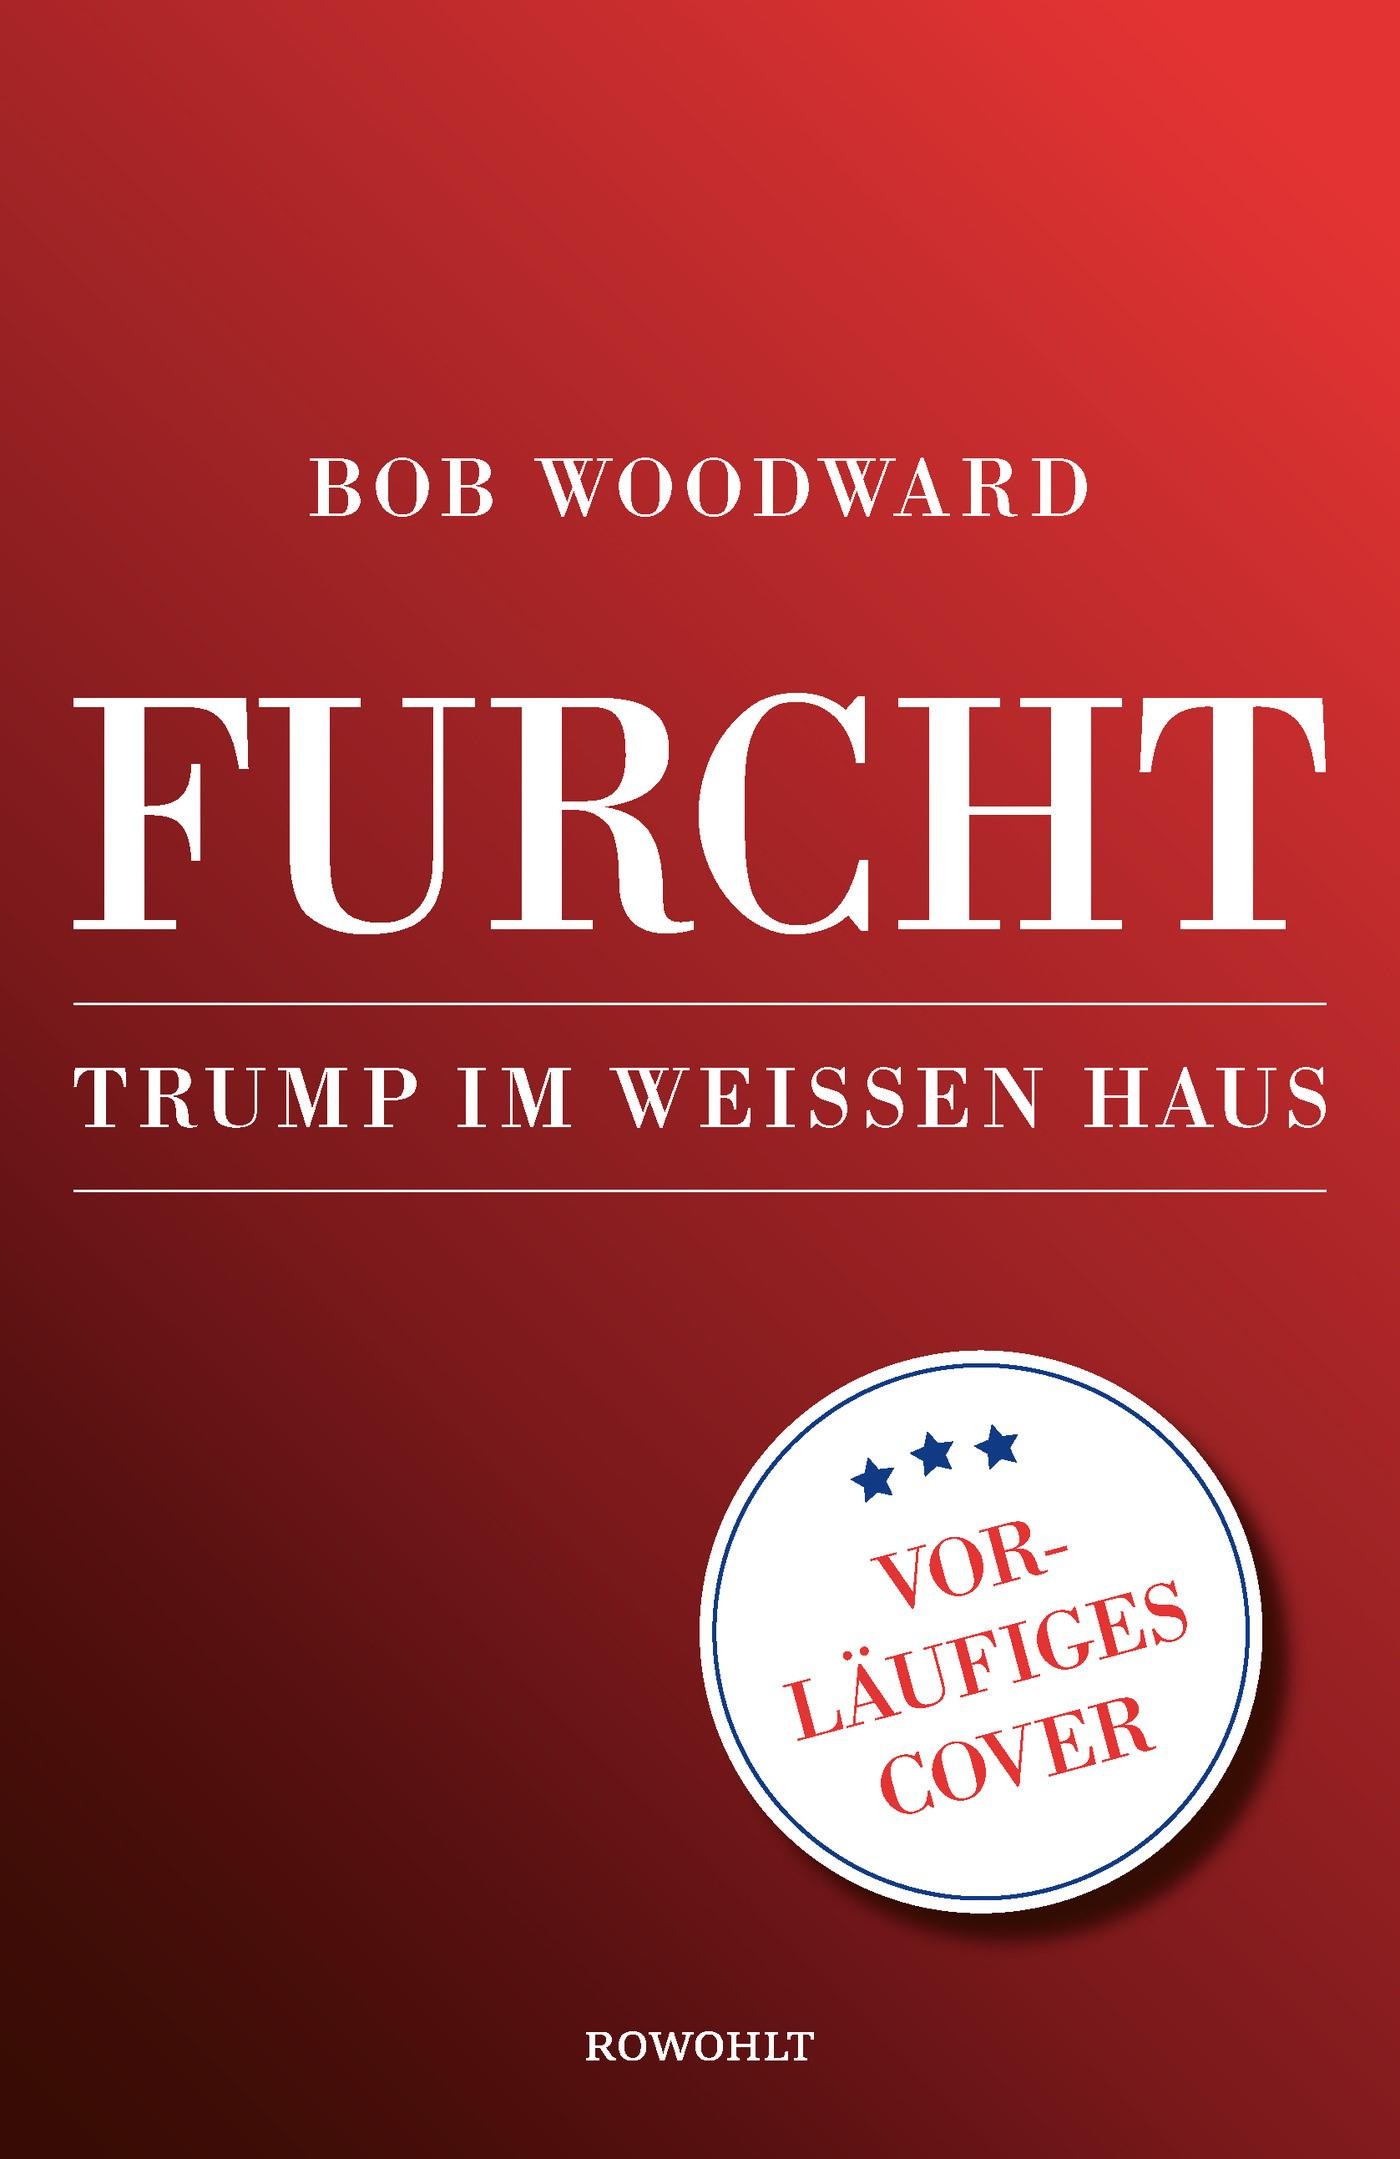 Furcht | Woodward | 1. Auflage, 2018 | Buch (Cover)